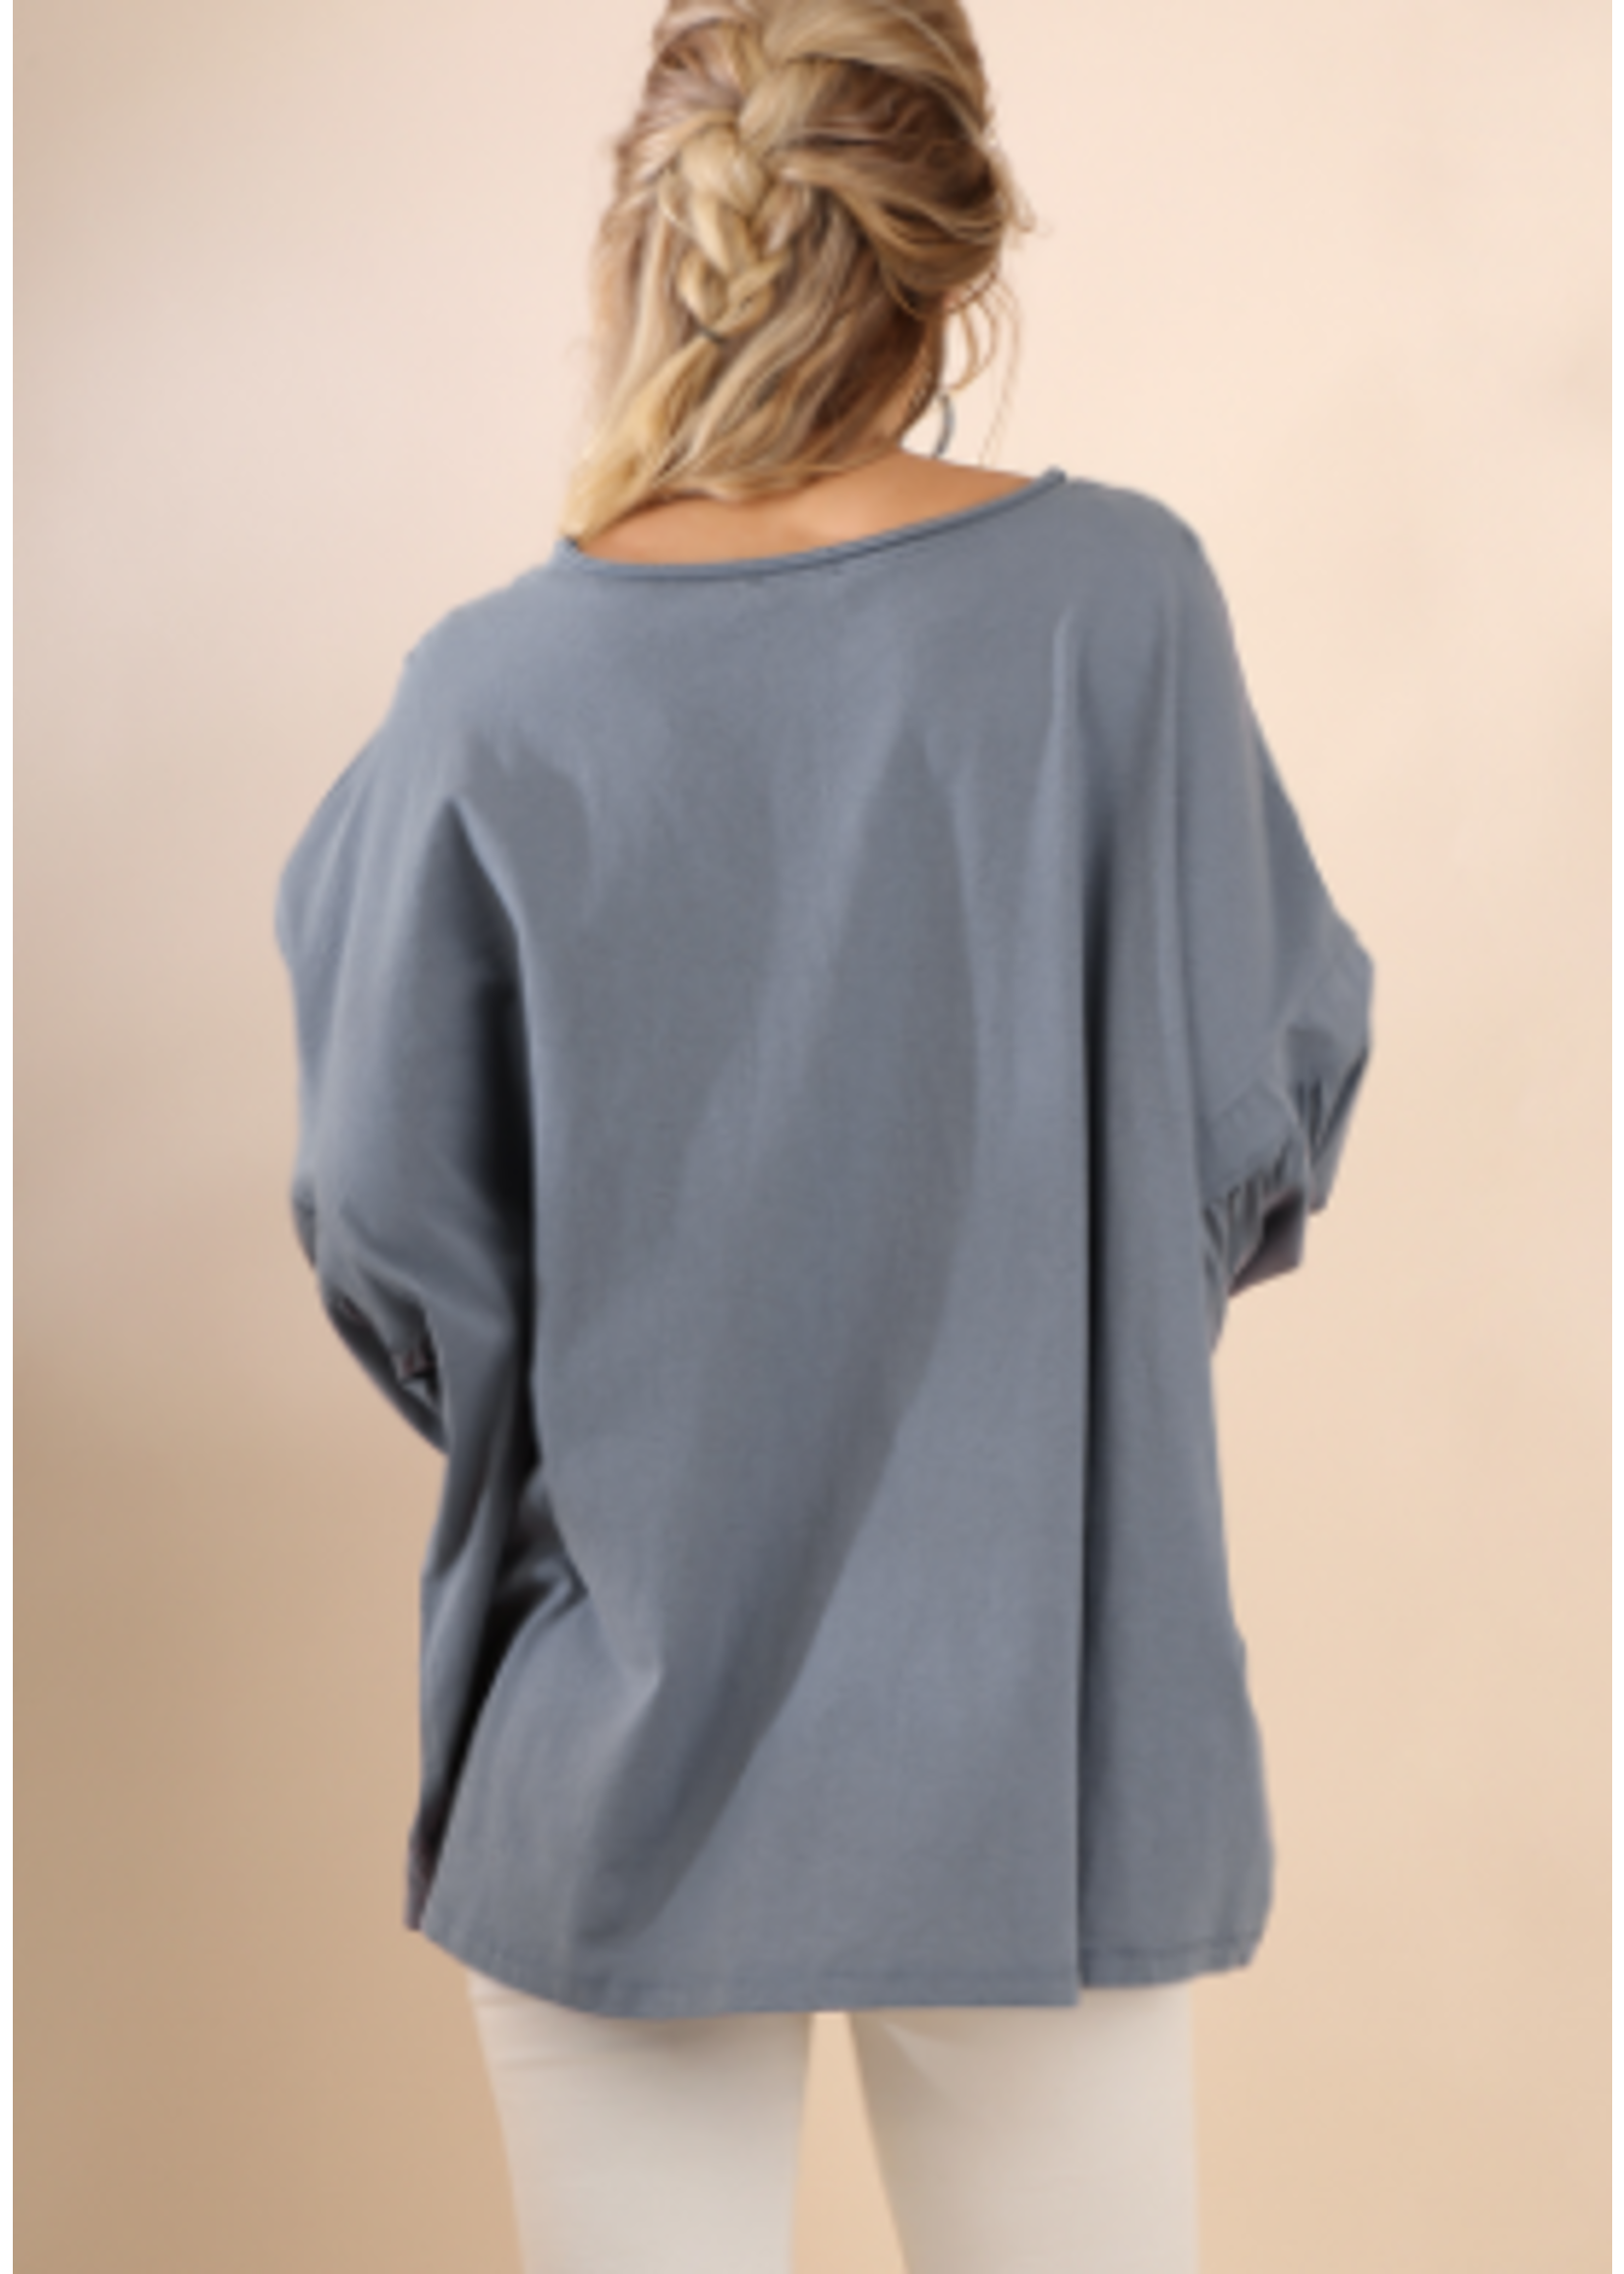 Blue Ash 3/4 Sleeve Top